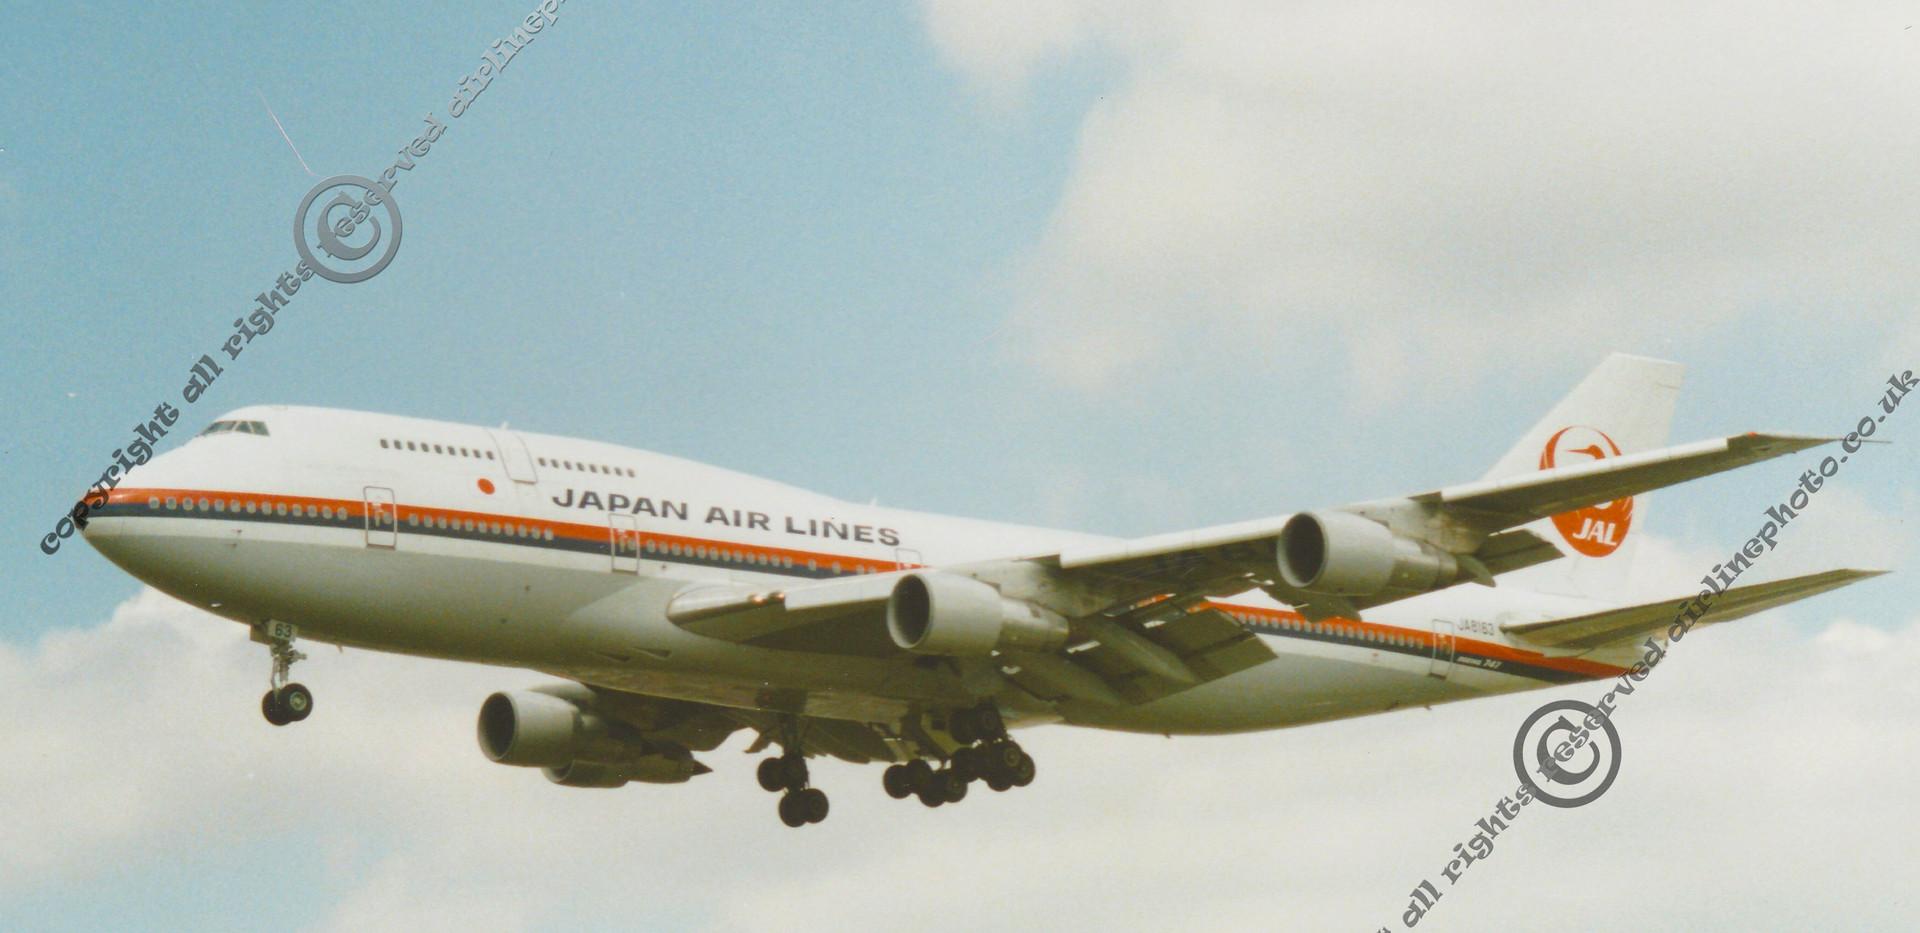 JA8163-JAL-Japan-Airlines-747-LHR-1991.j